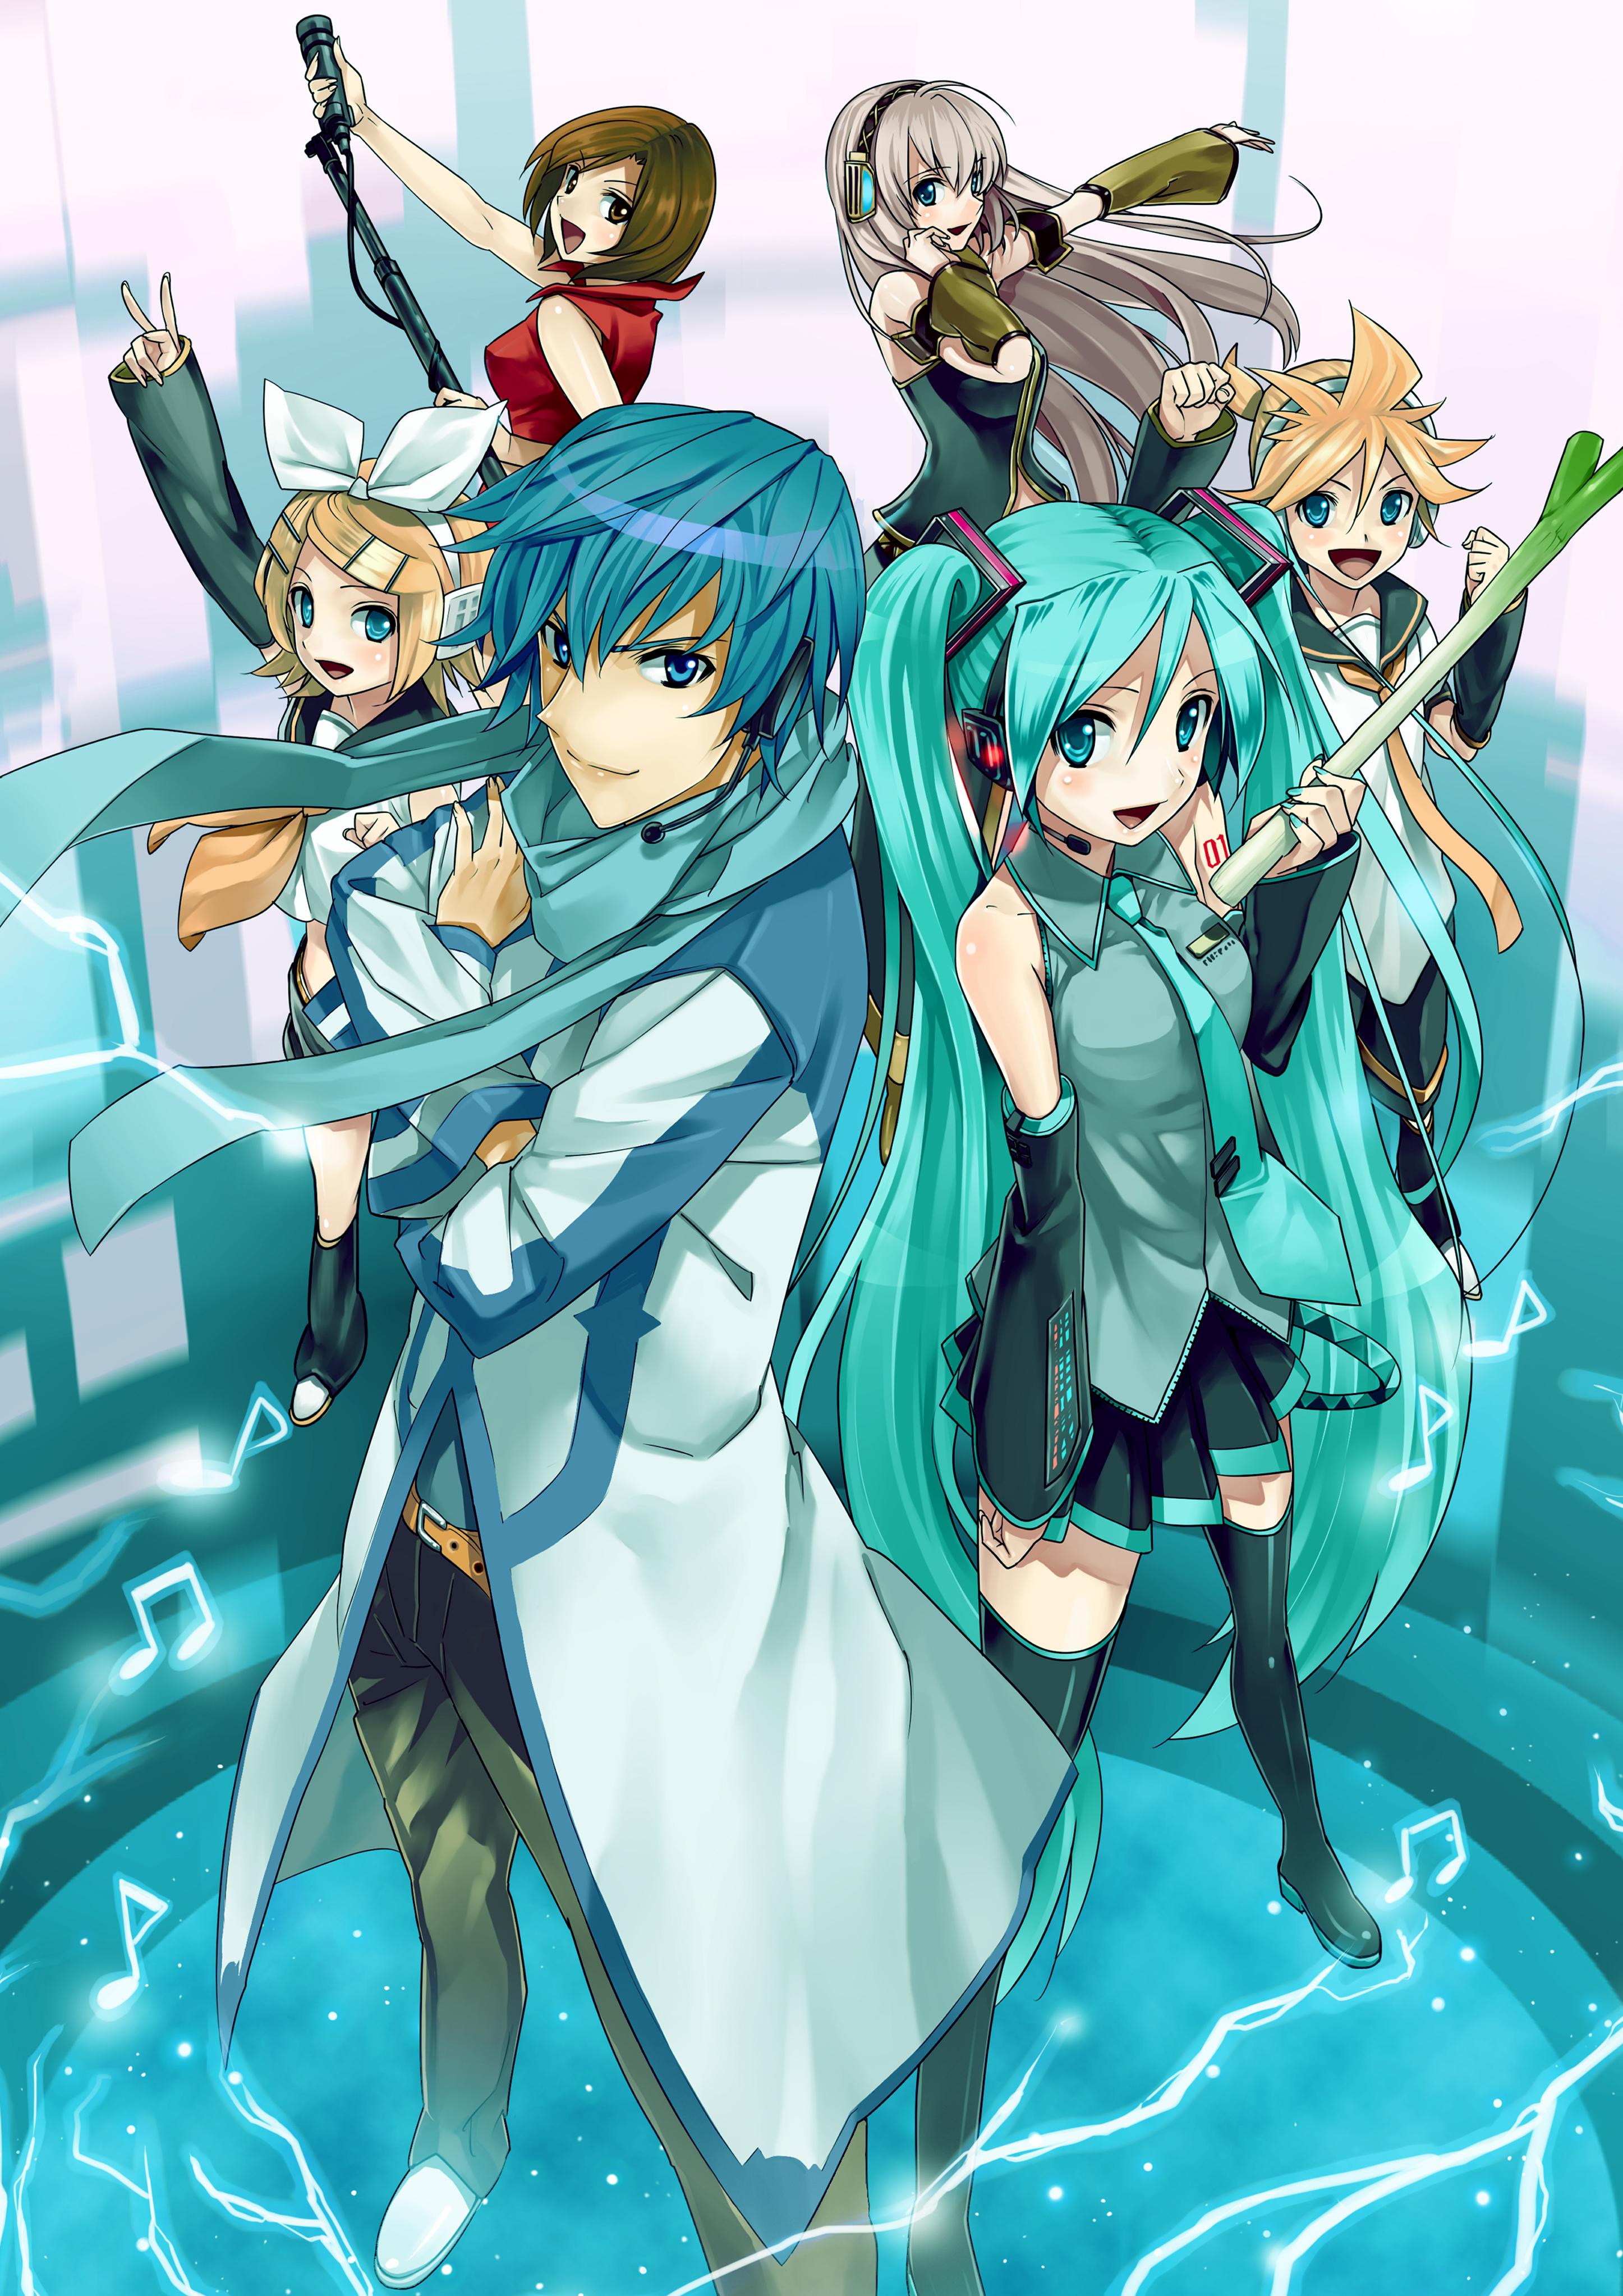 vocaloid mobile wallpaper 770922 zerochan anime image board